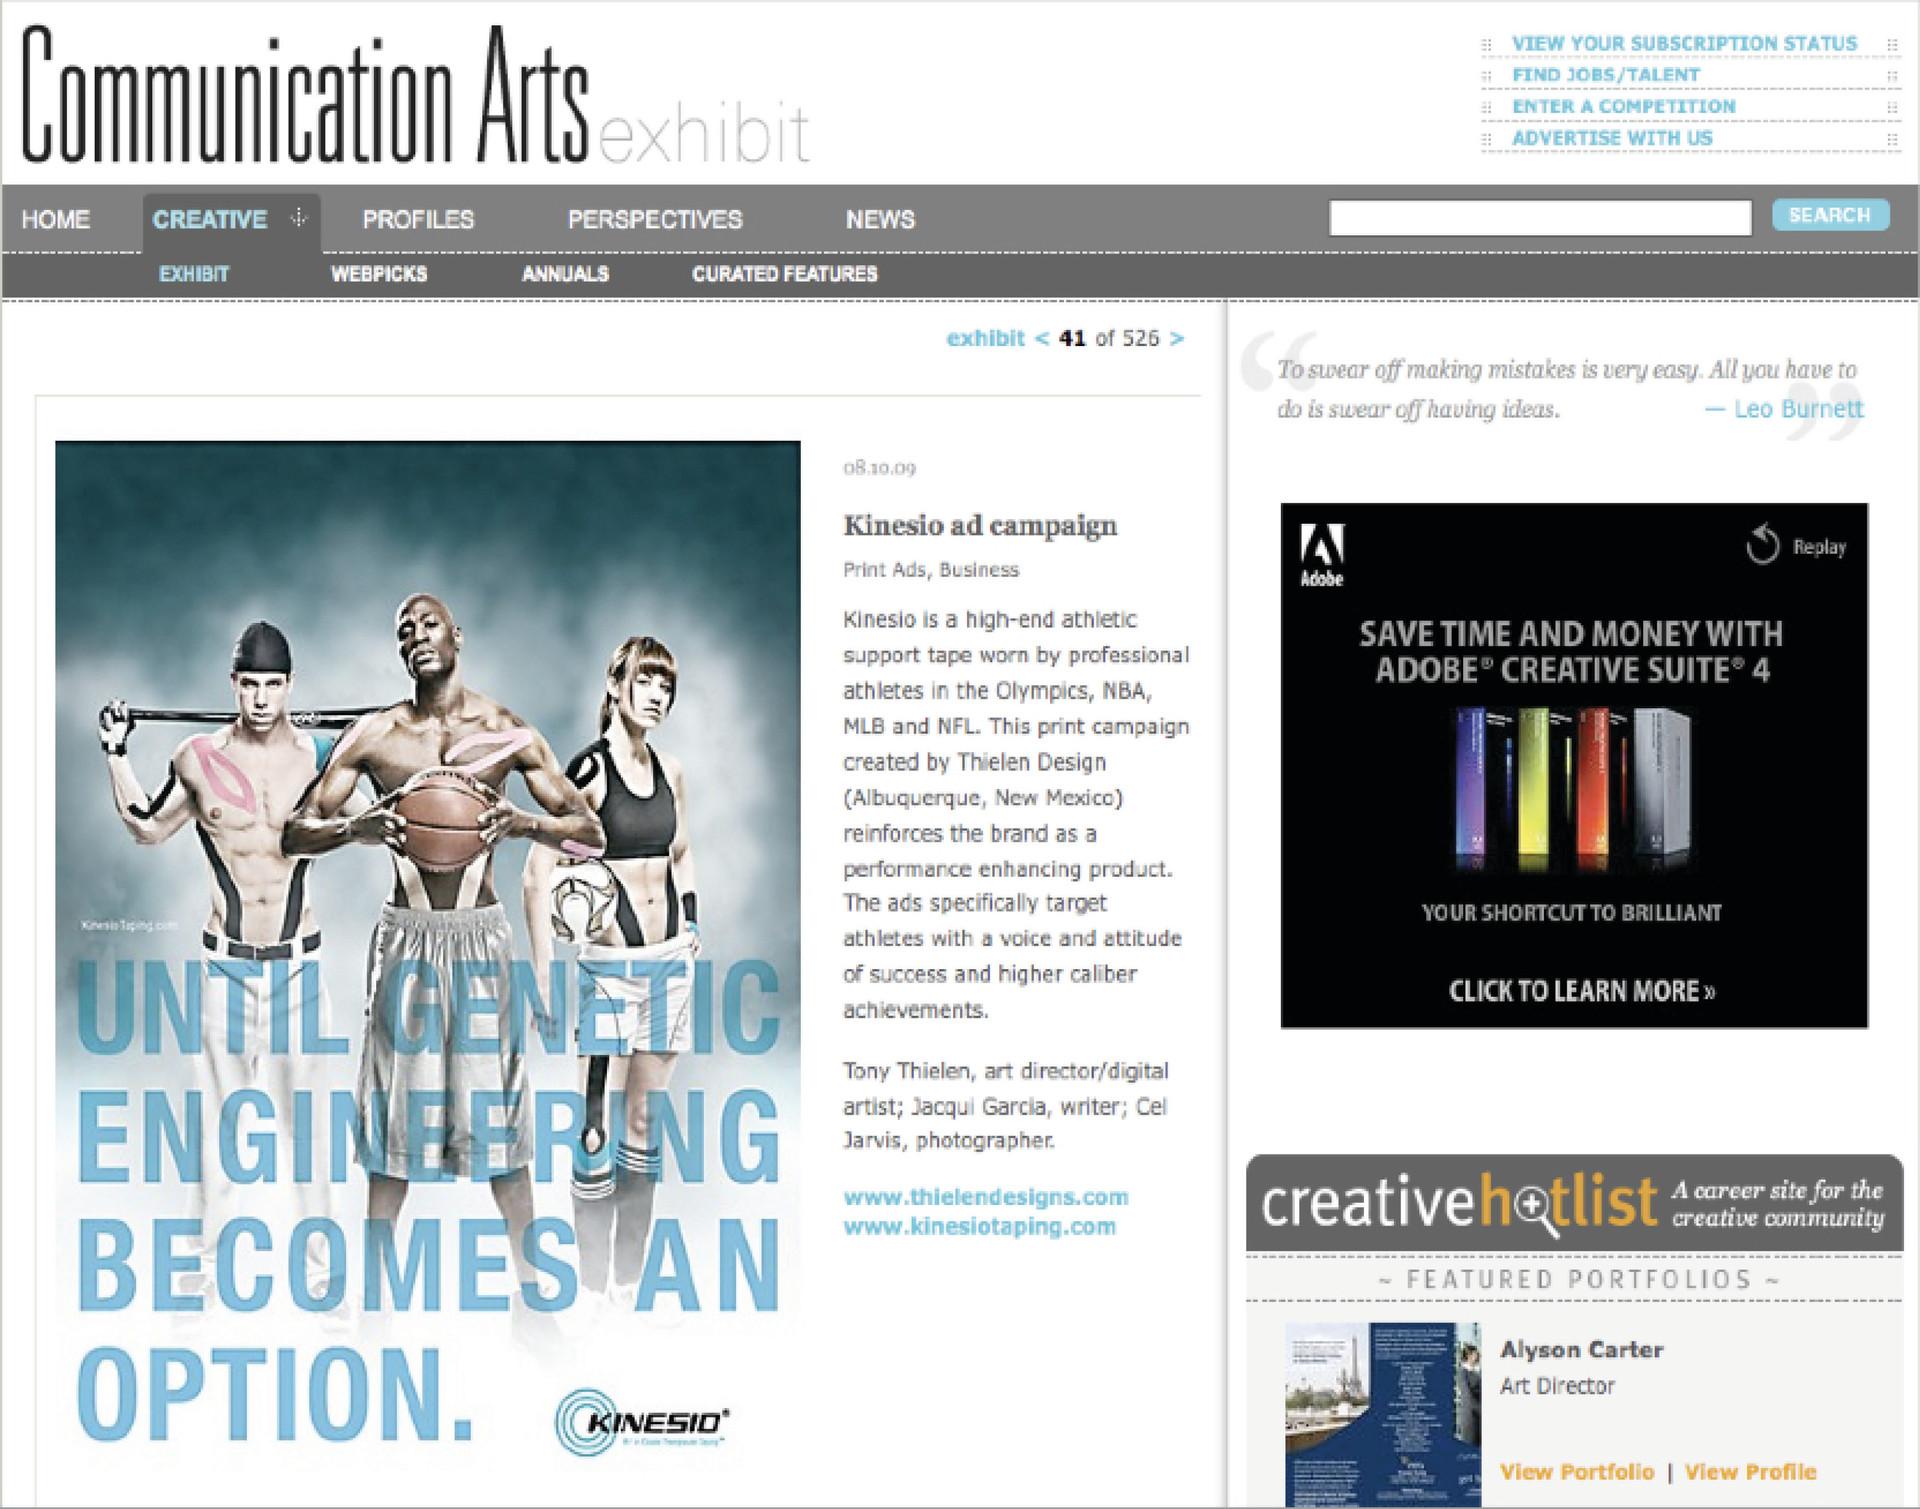 Communications Arts Exhibit Feature